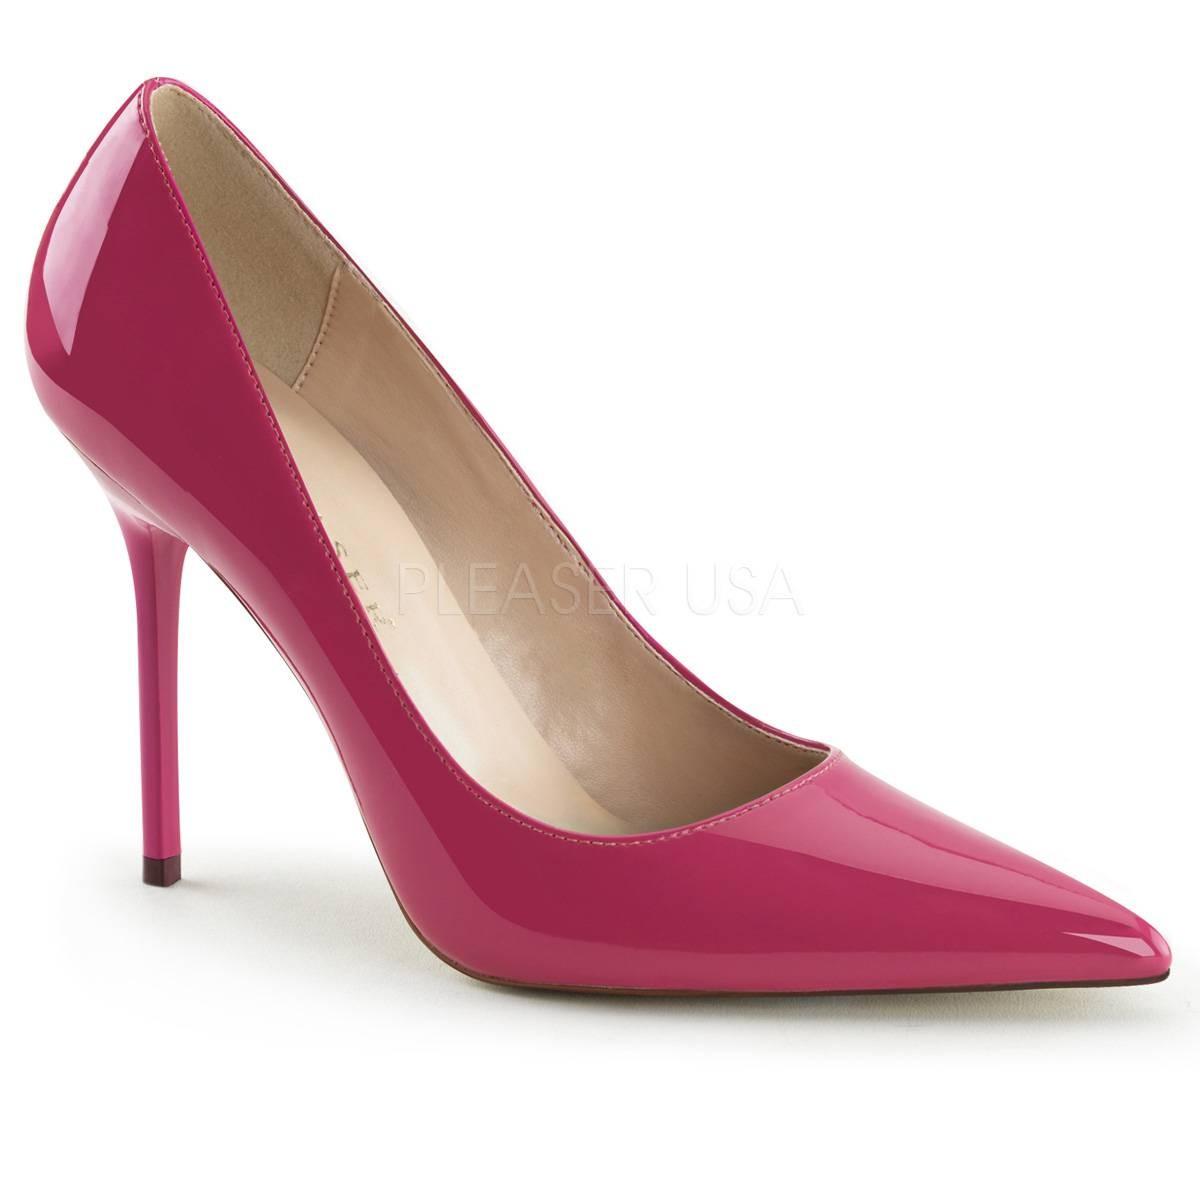 Pumps - CLASSIQUE 20 ° Damen Pumps ° Pink Glänzend ° Pleaser  - Onlineshop RedSixty